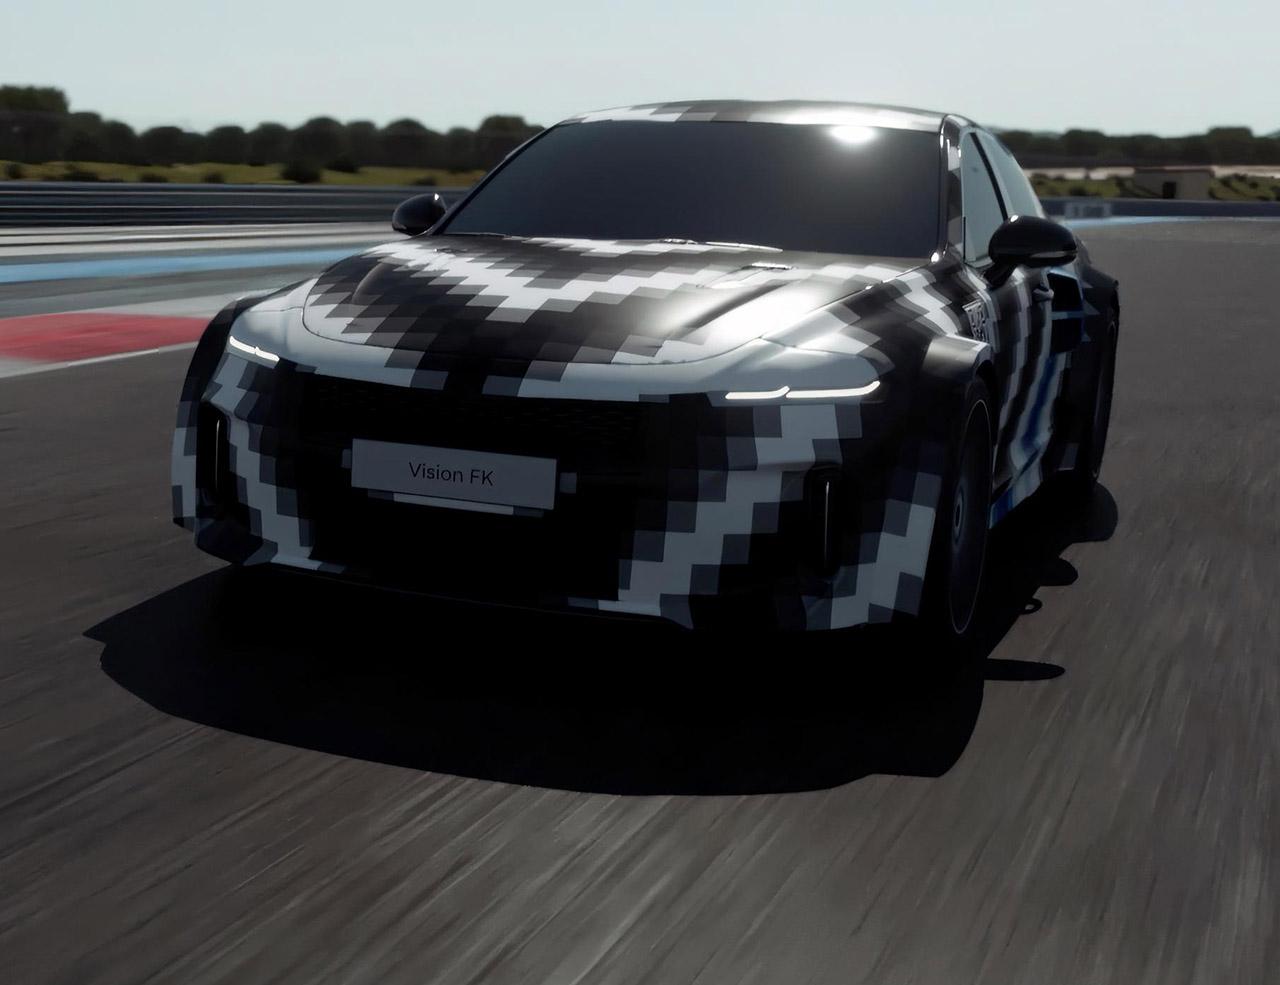 Hyundai Vision FK Hydrogen Powered Car